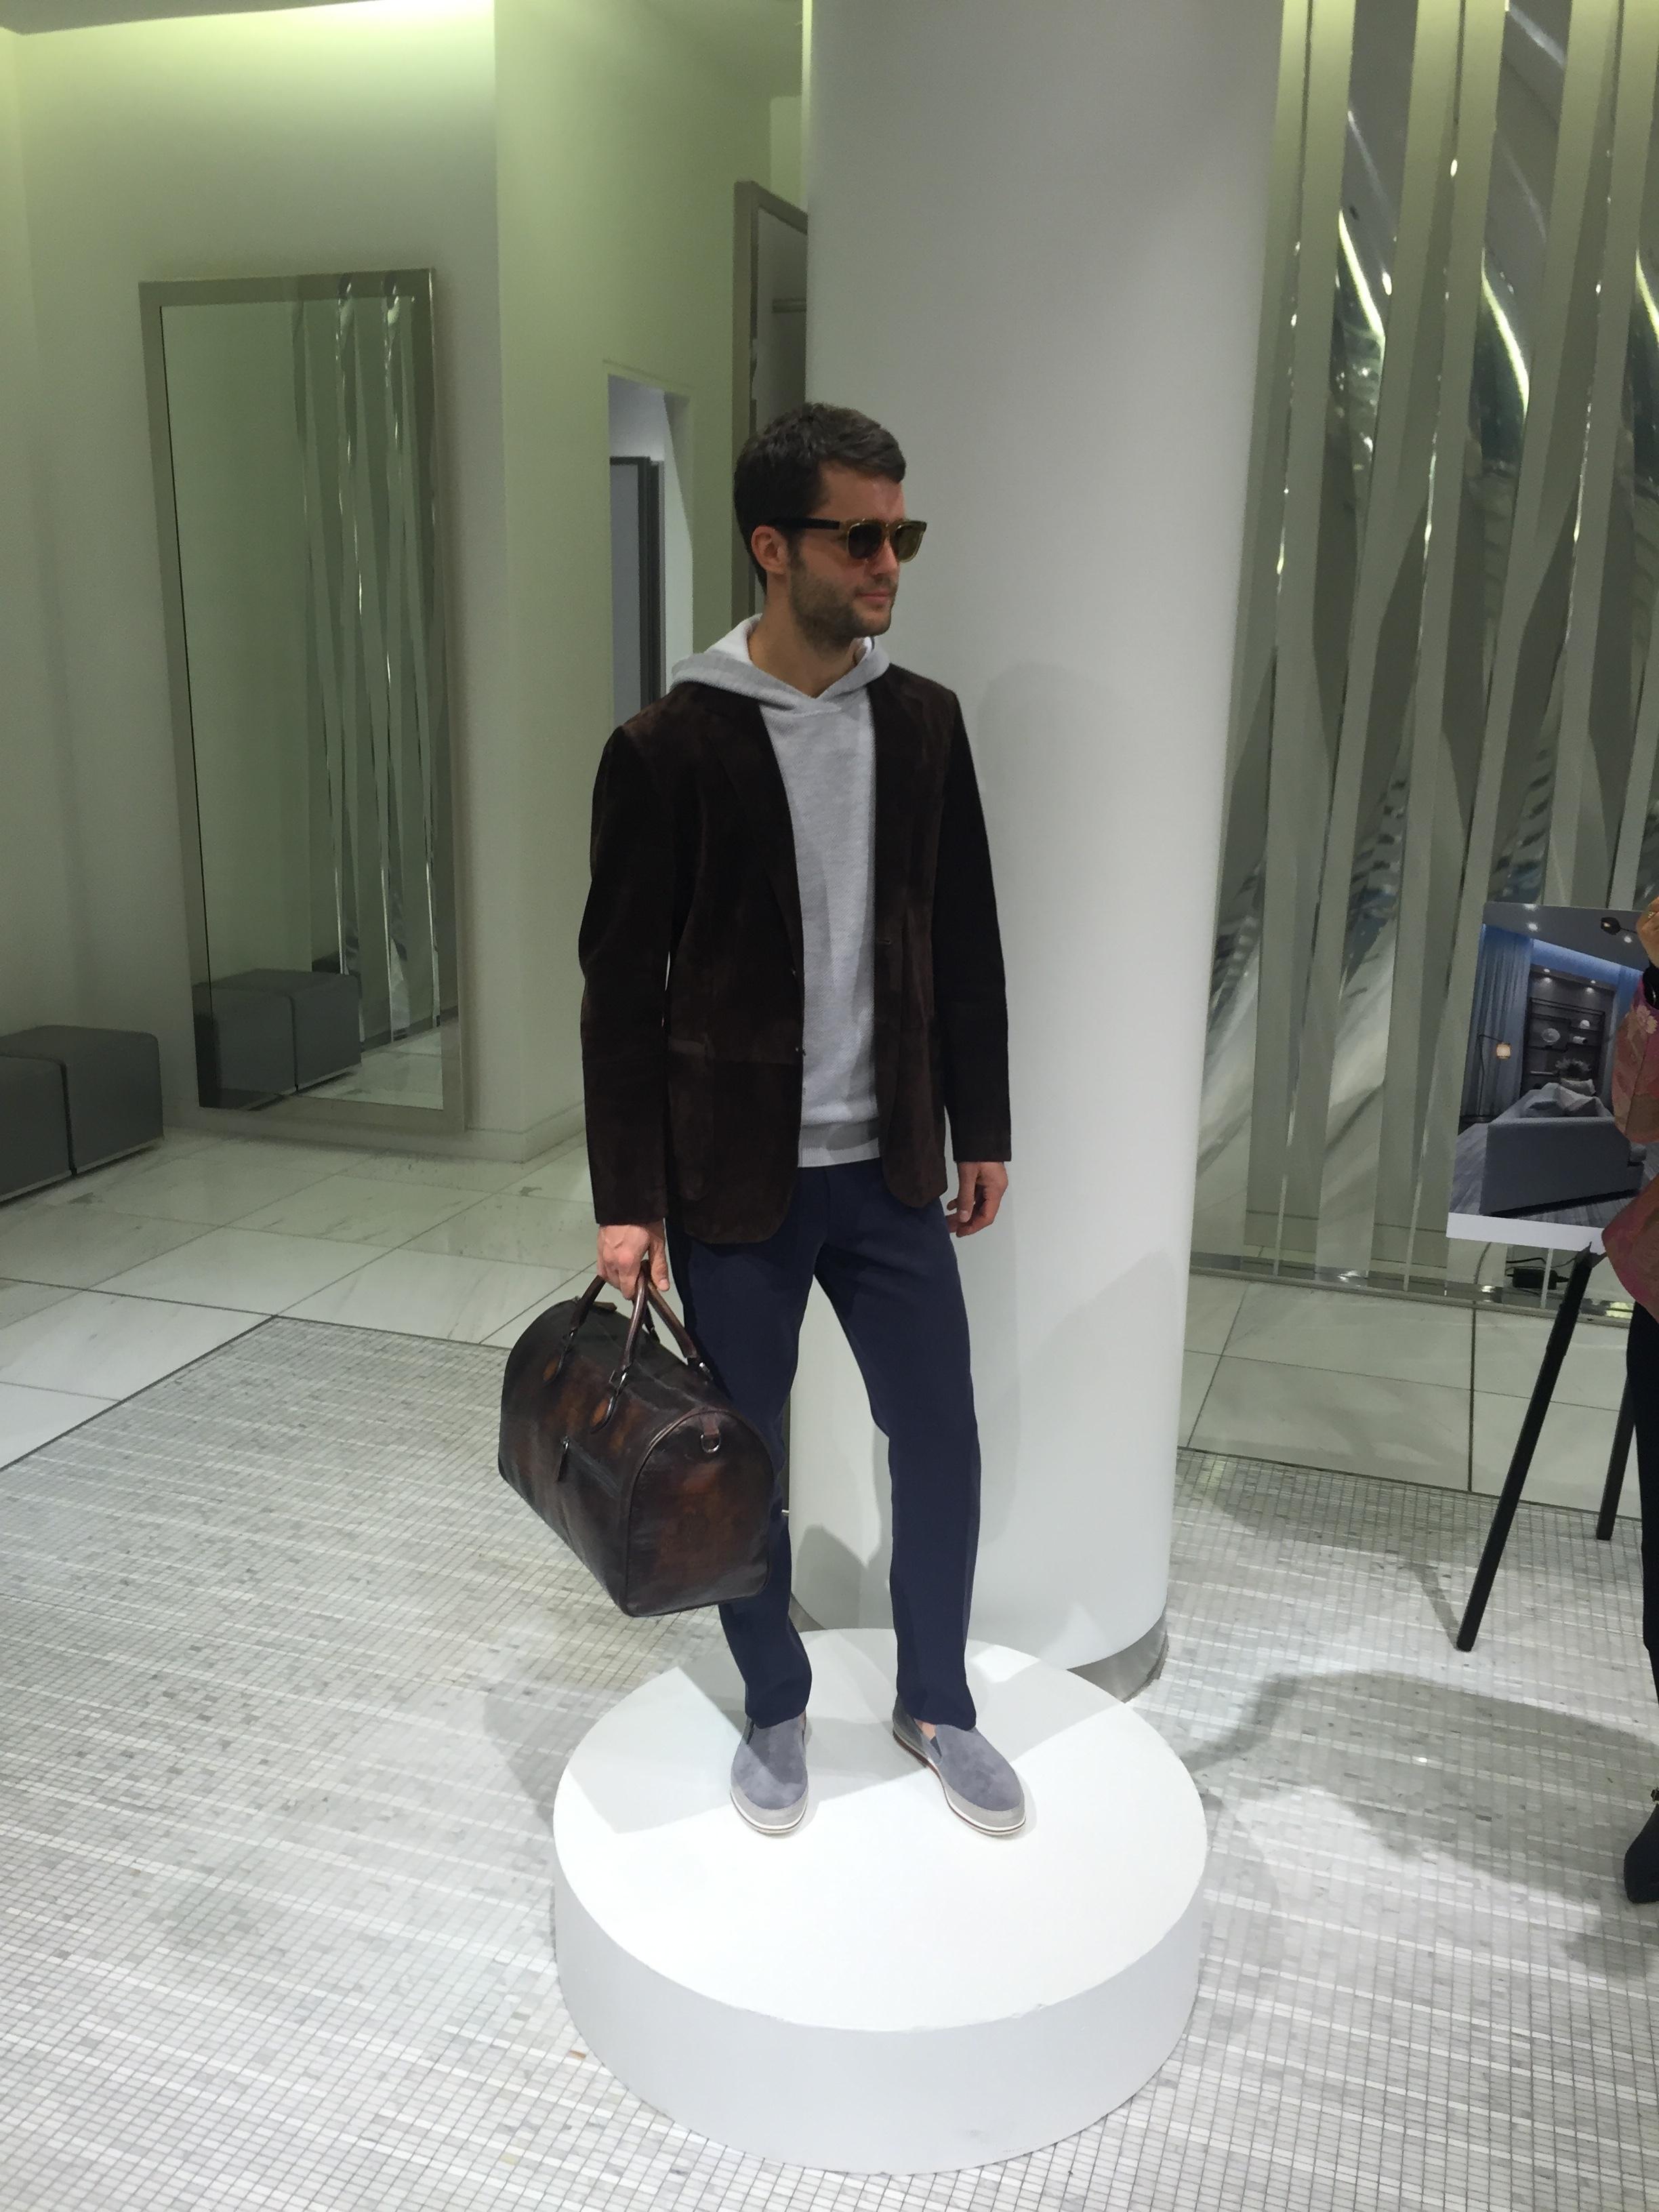 Suede jacket, top, bag, all BERLUTI. Shoes by PRADA